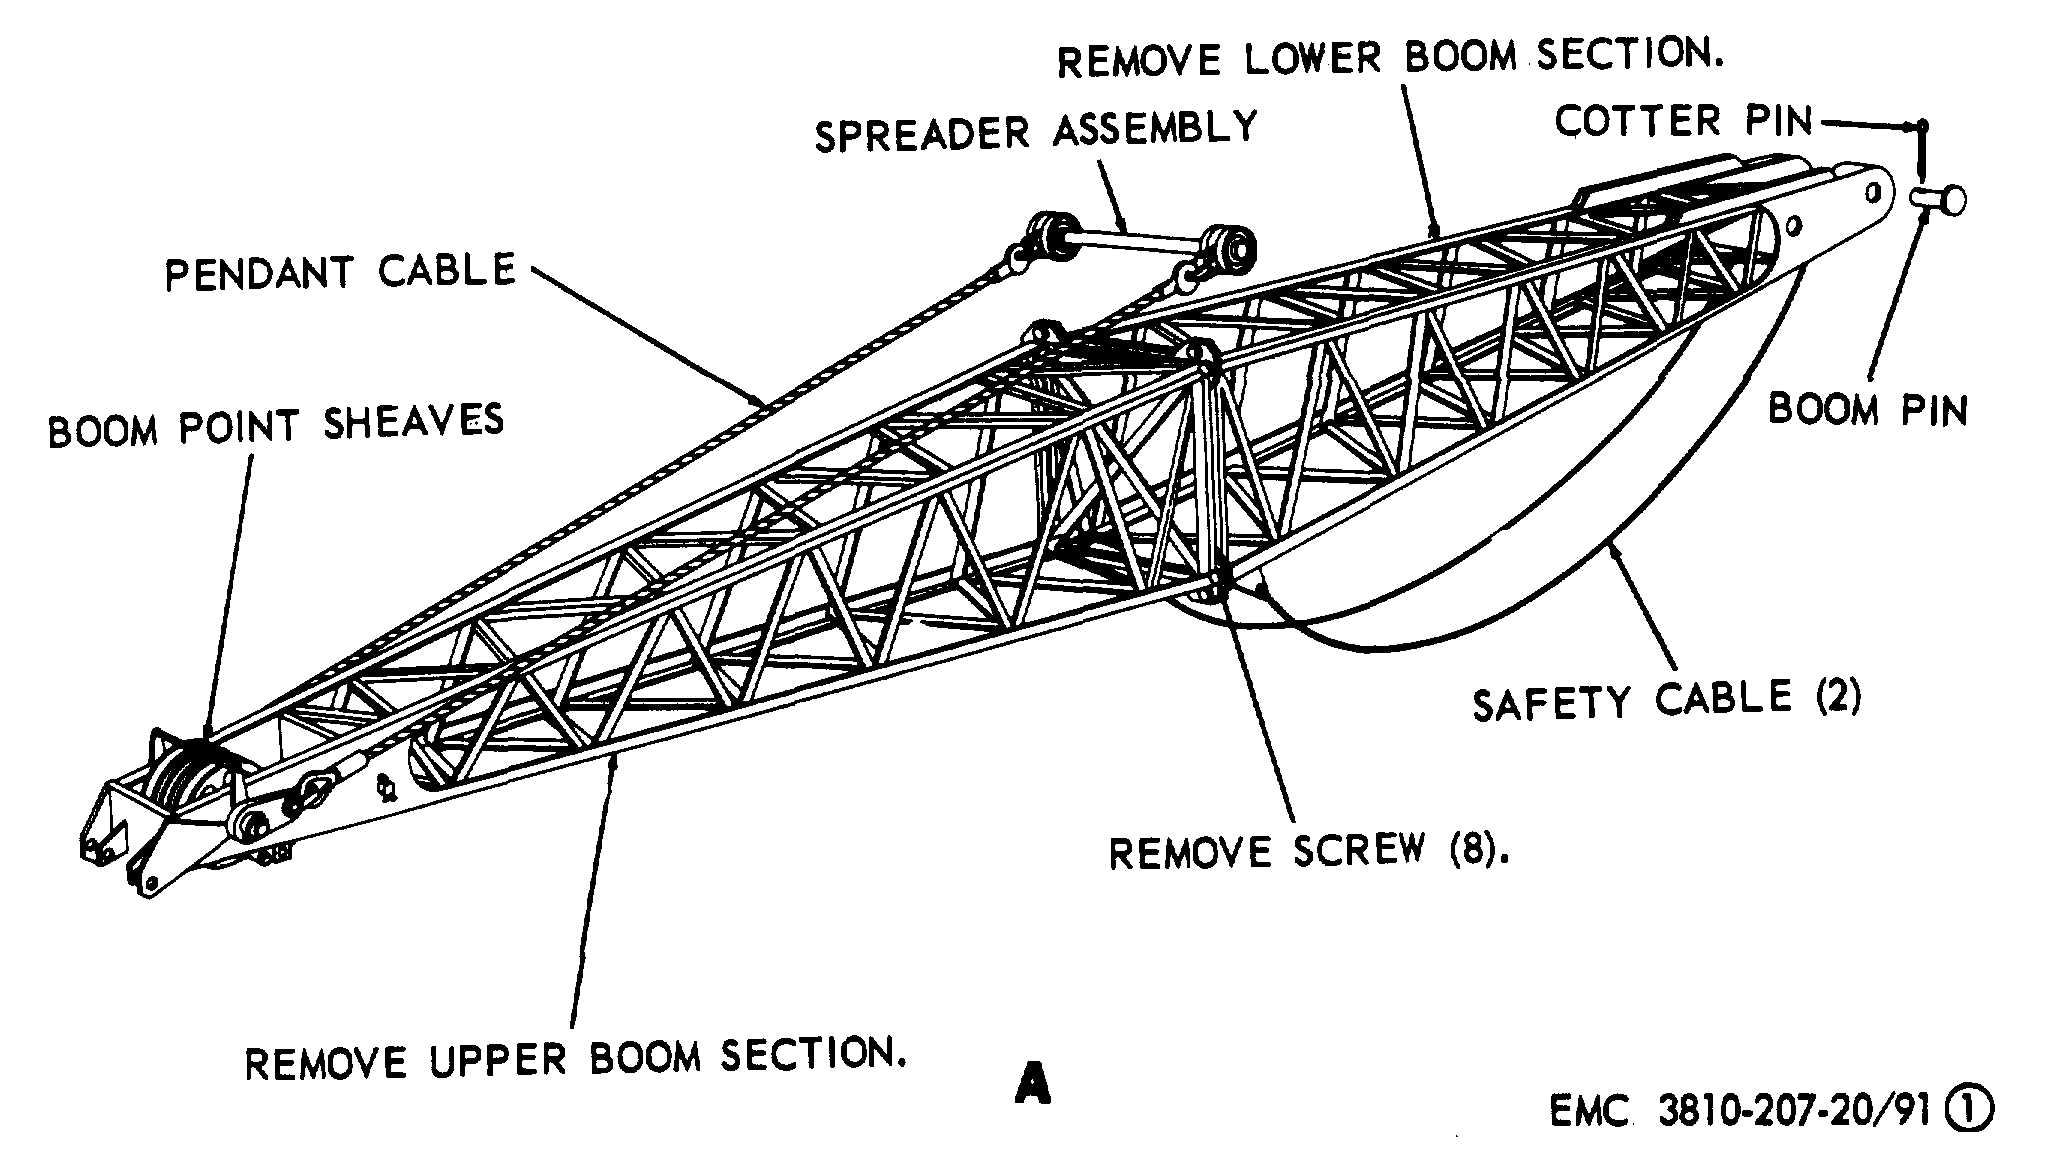 crane parts diagram pond ecosystem truck mounted get free image